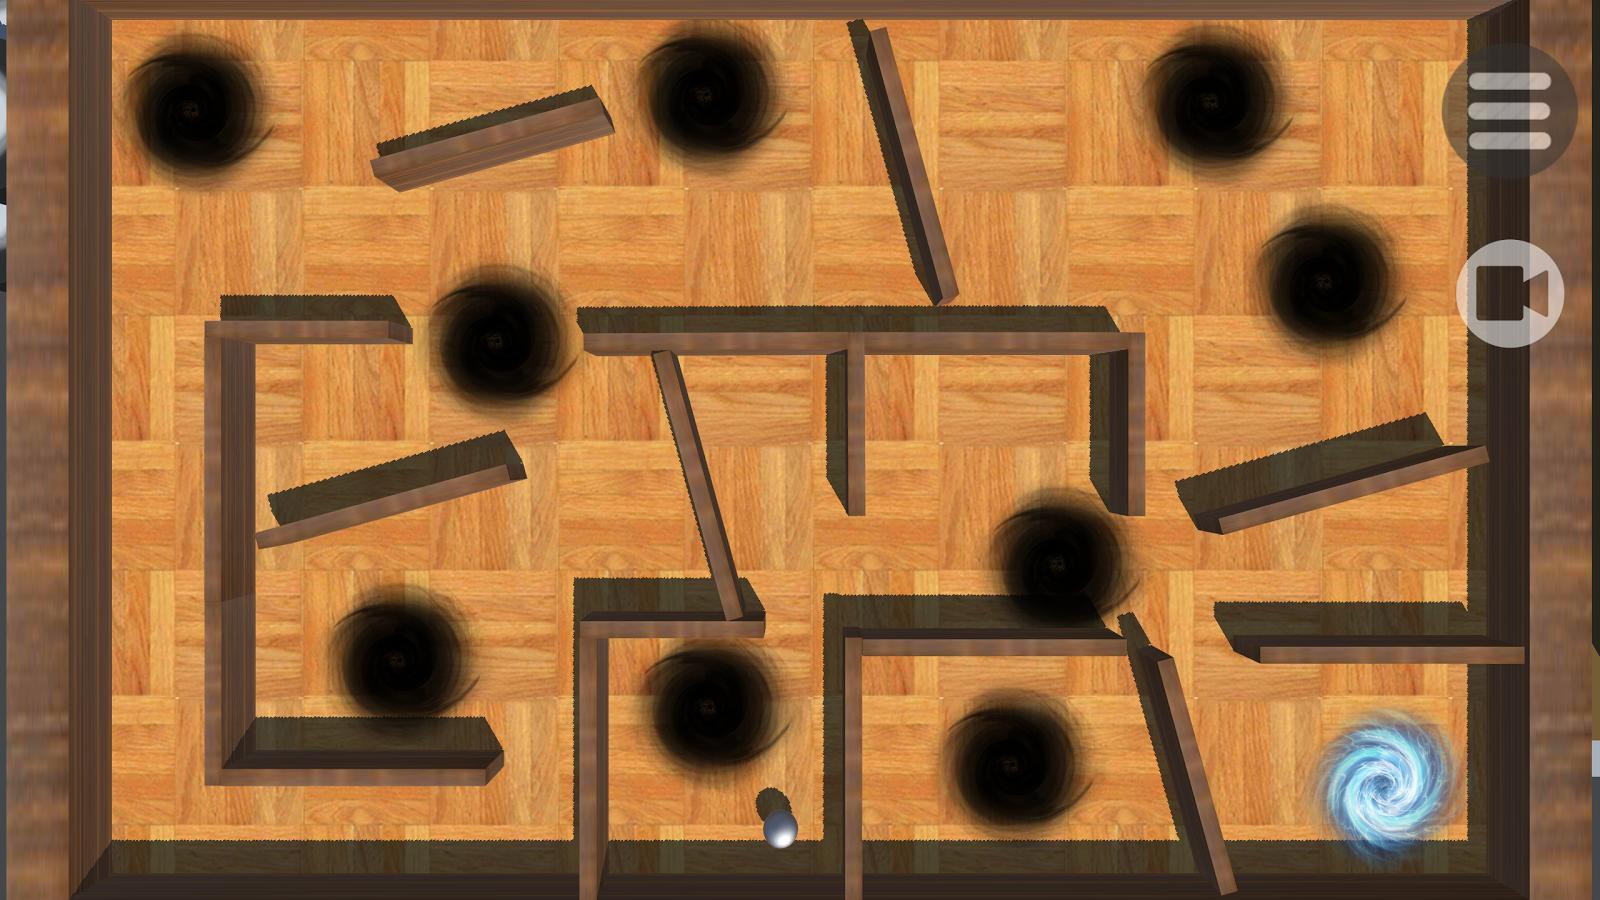 Tilt Maze: Ball Labyrinth game 1 0 1 APK Download - Android